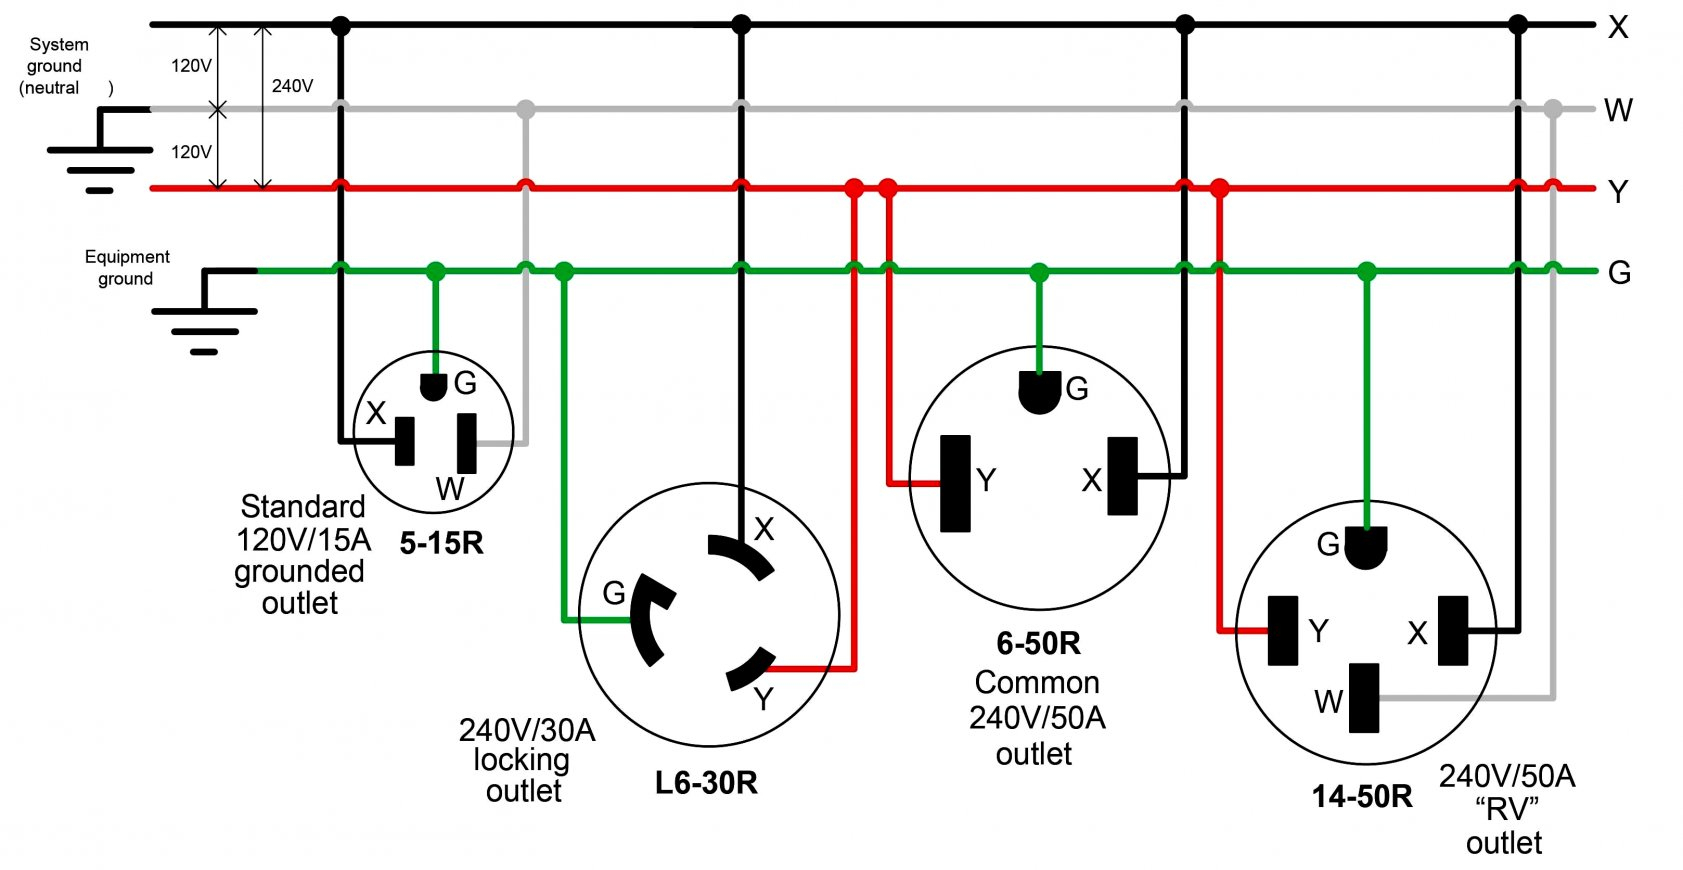 L14 30R Wiring | Wiring Diagram - Nema L14-30 Wiring Diagram